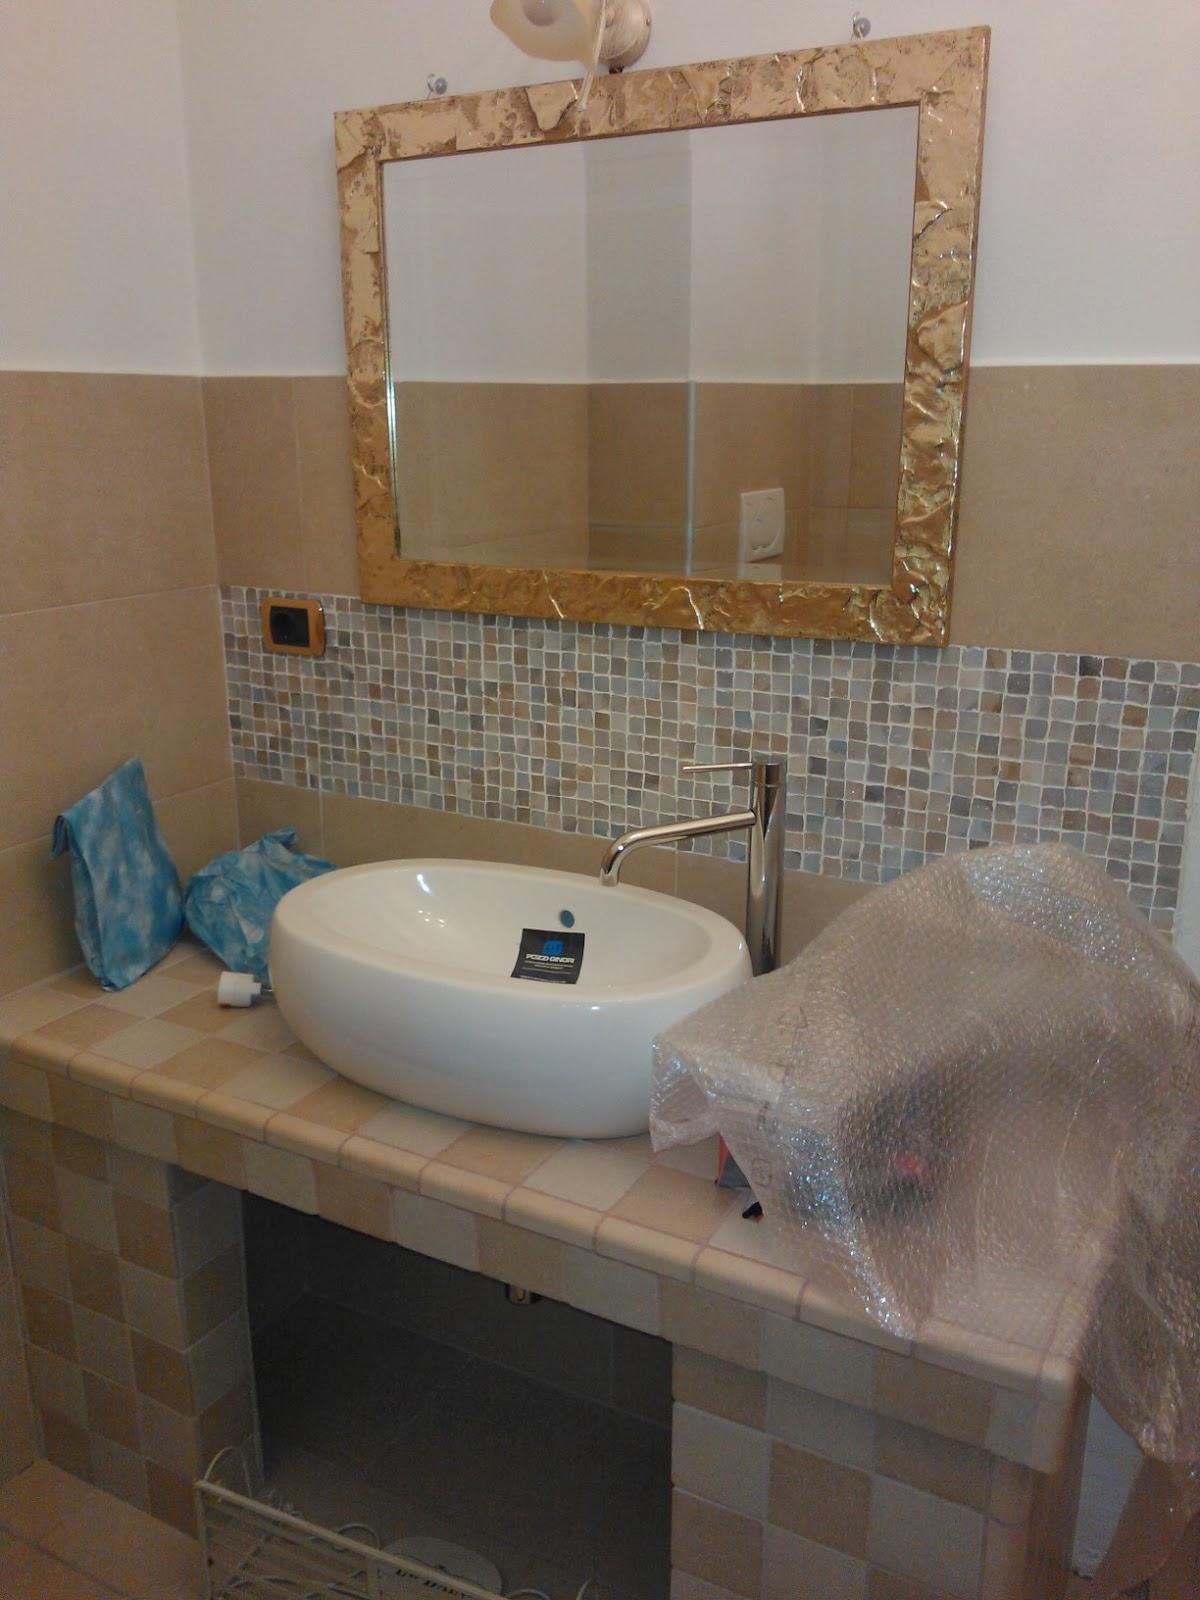 bagno in muratura moderno. bagni in muratura moderni cemento e ... - Bagni In Muratura Moderni